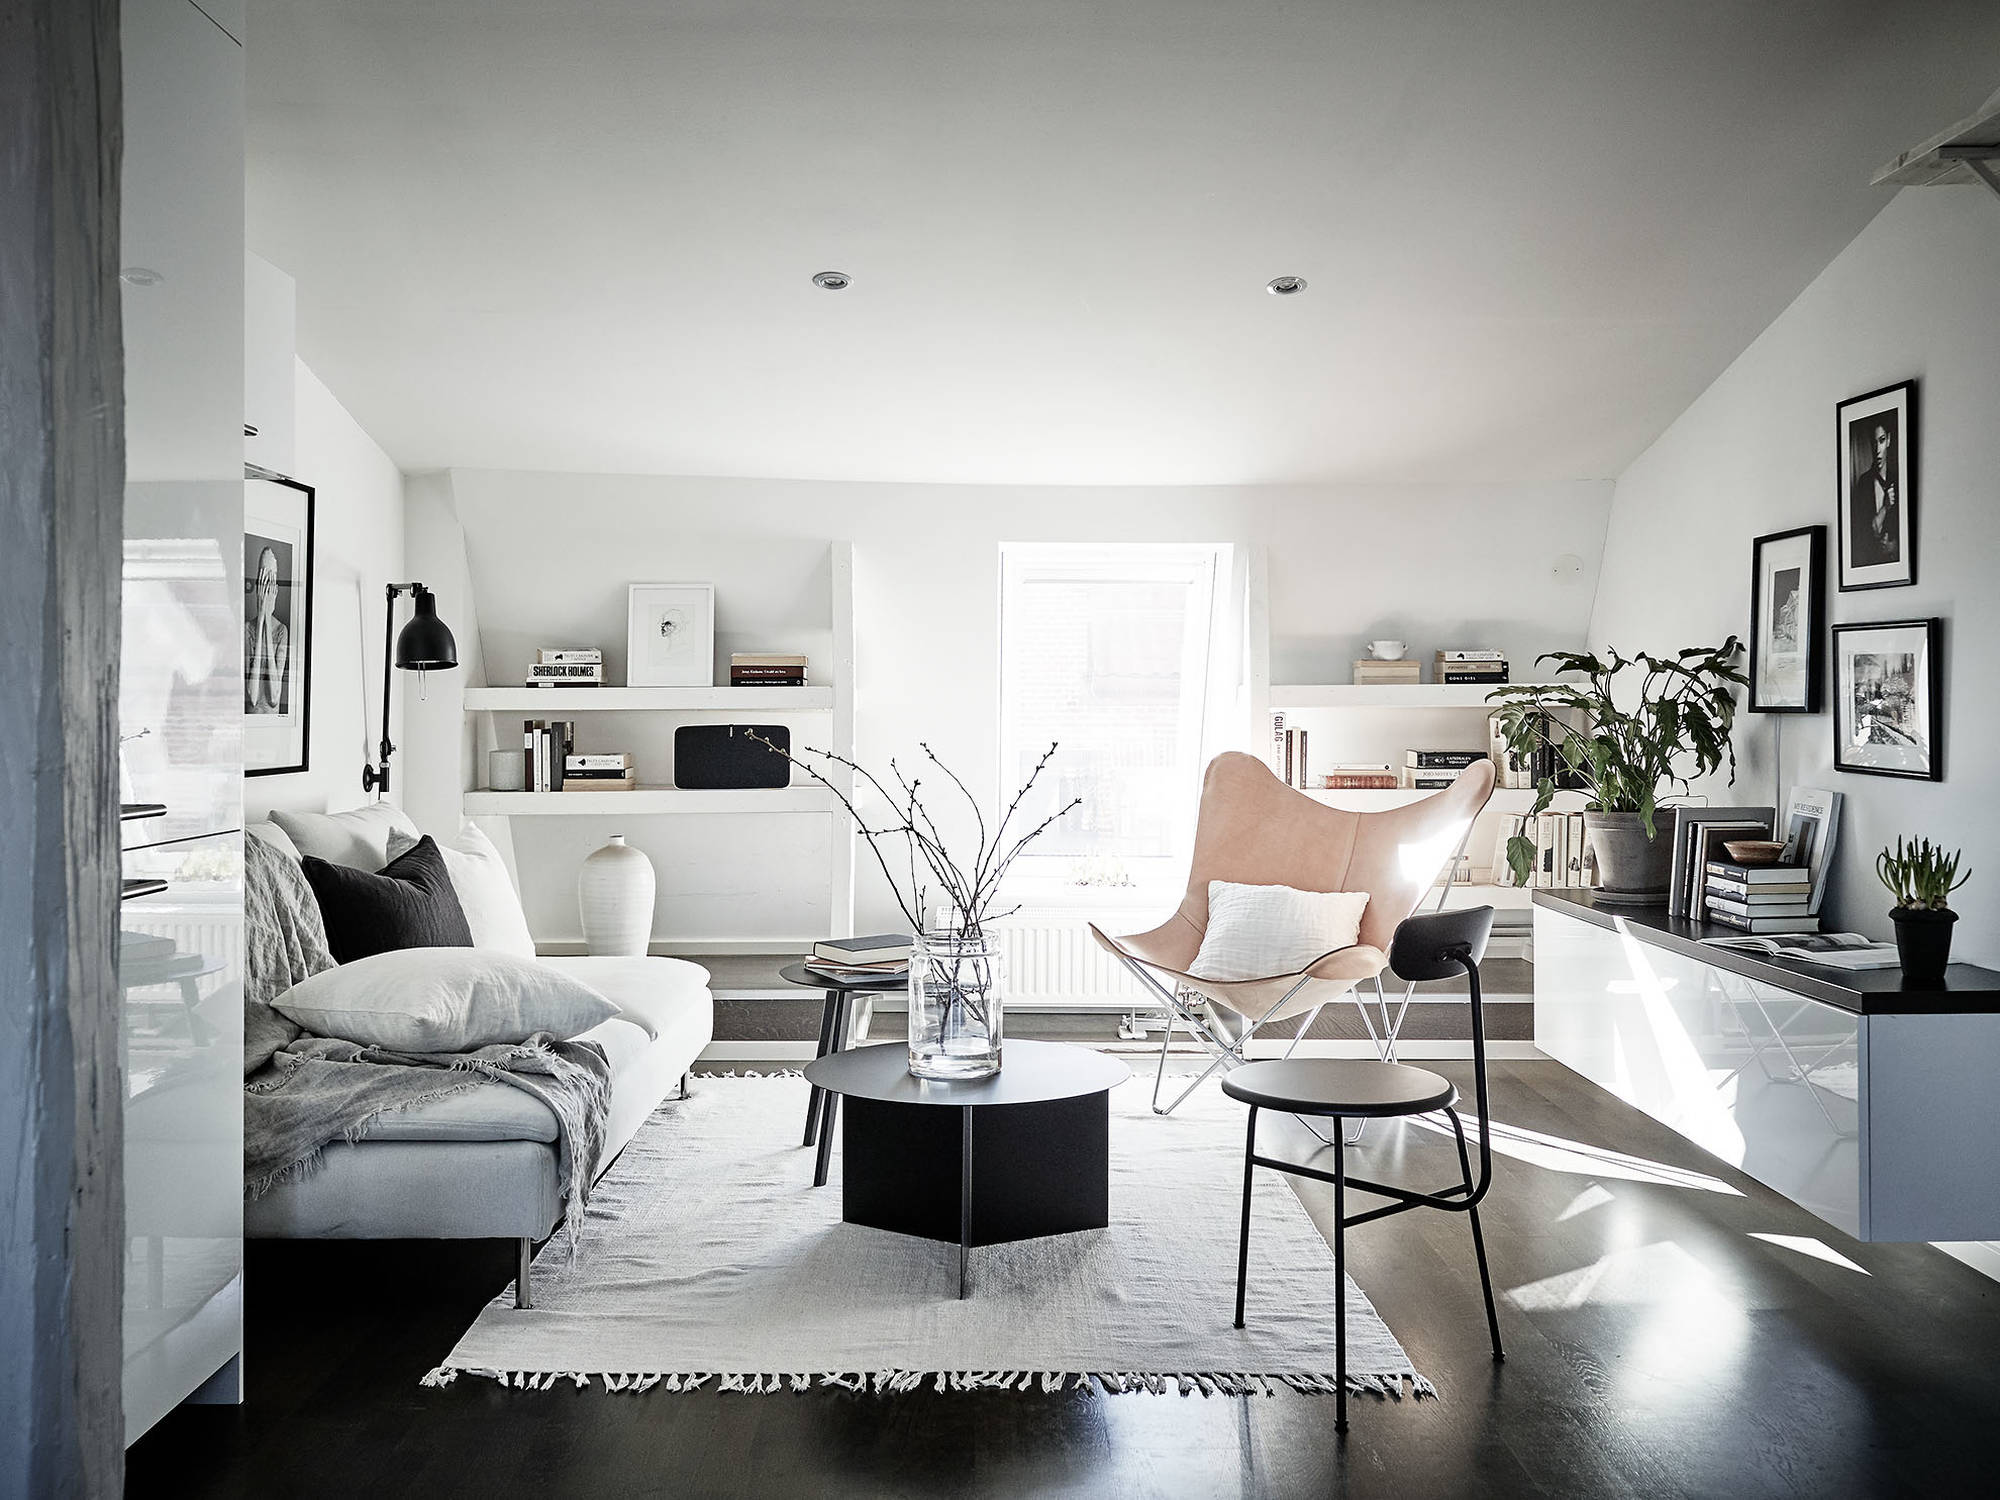 Apartments stylish design new photo